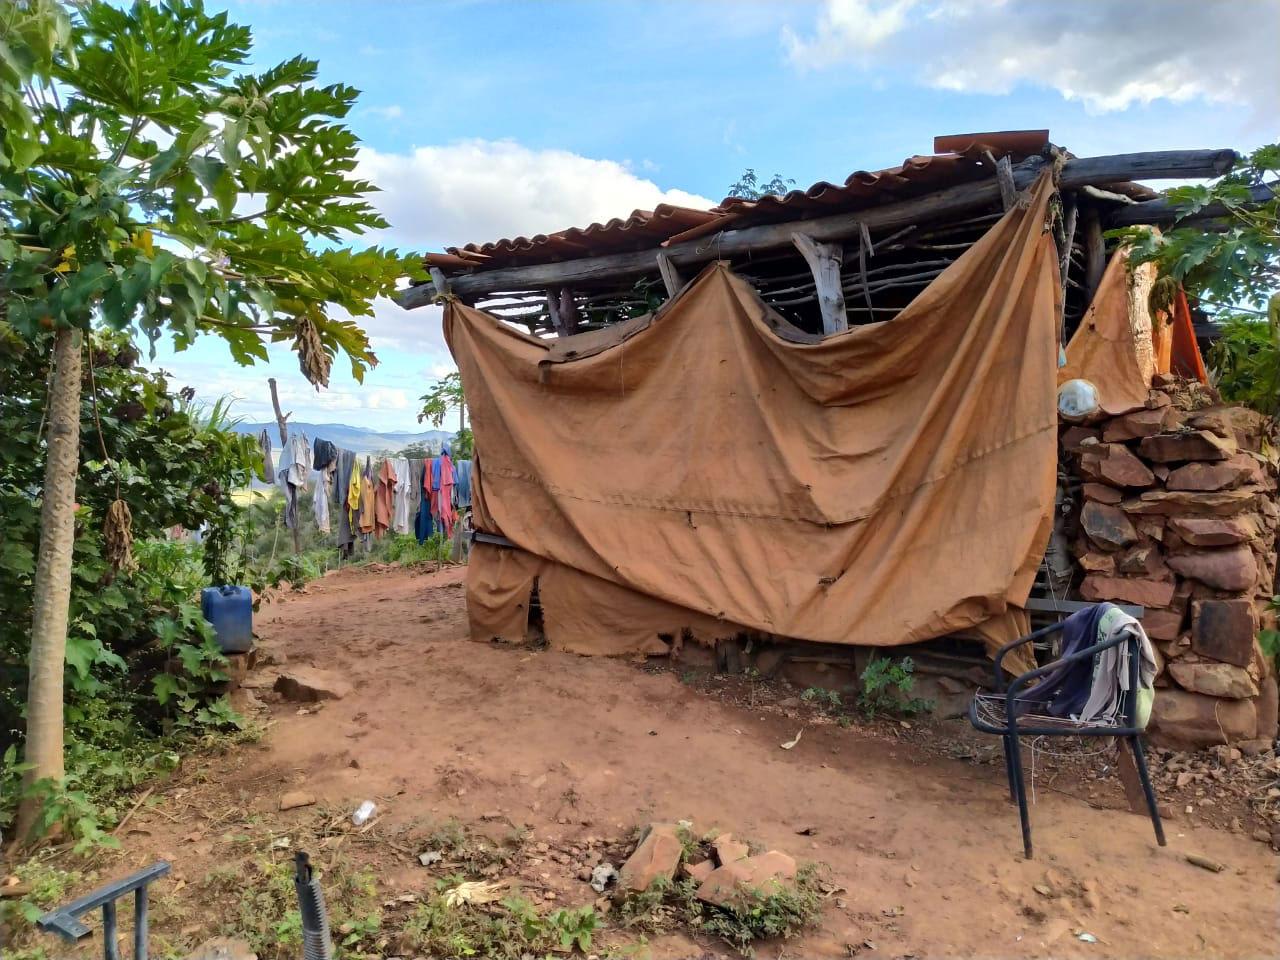 cabana idoso sertão pernambuco